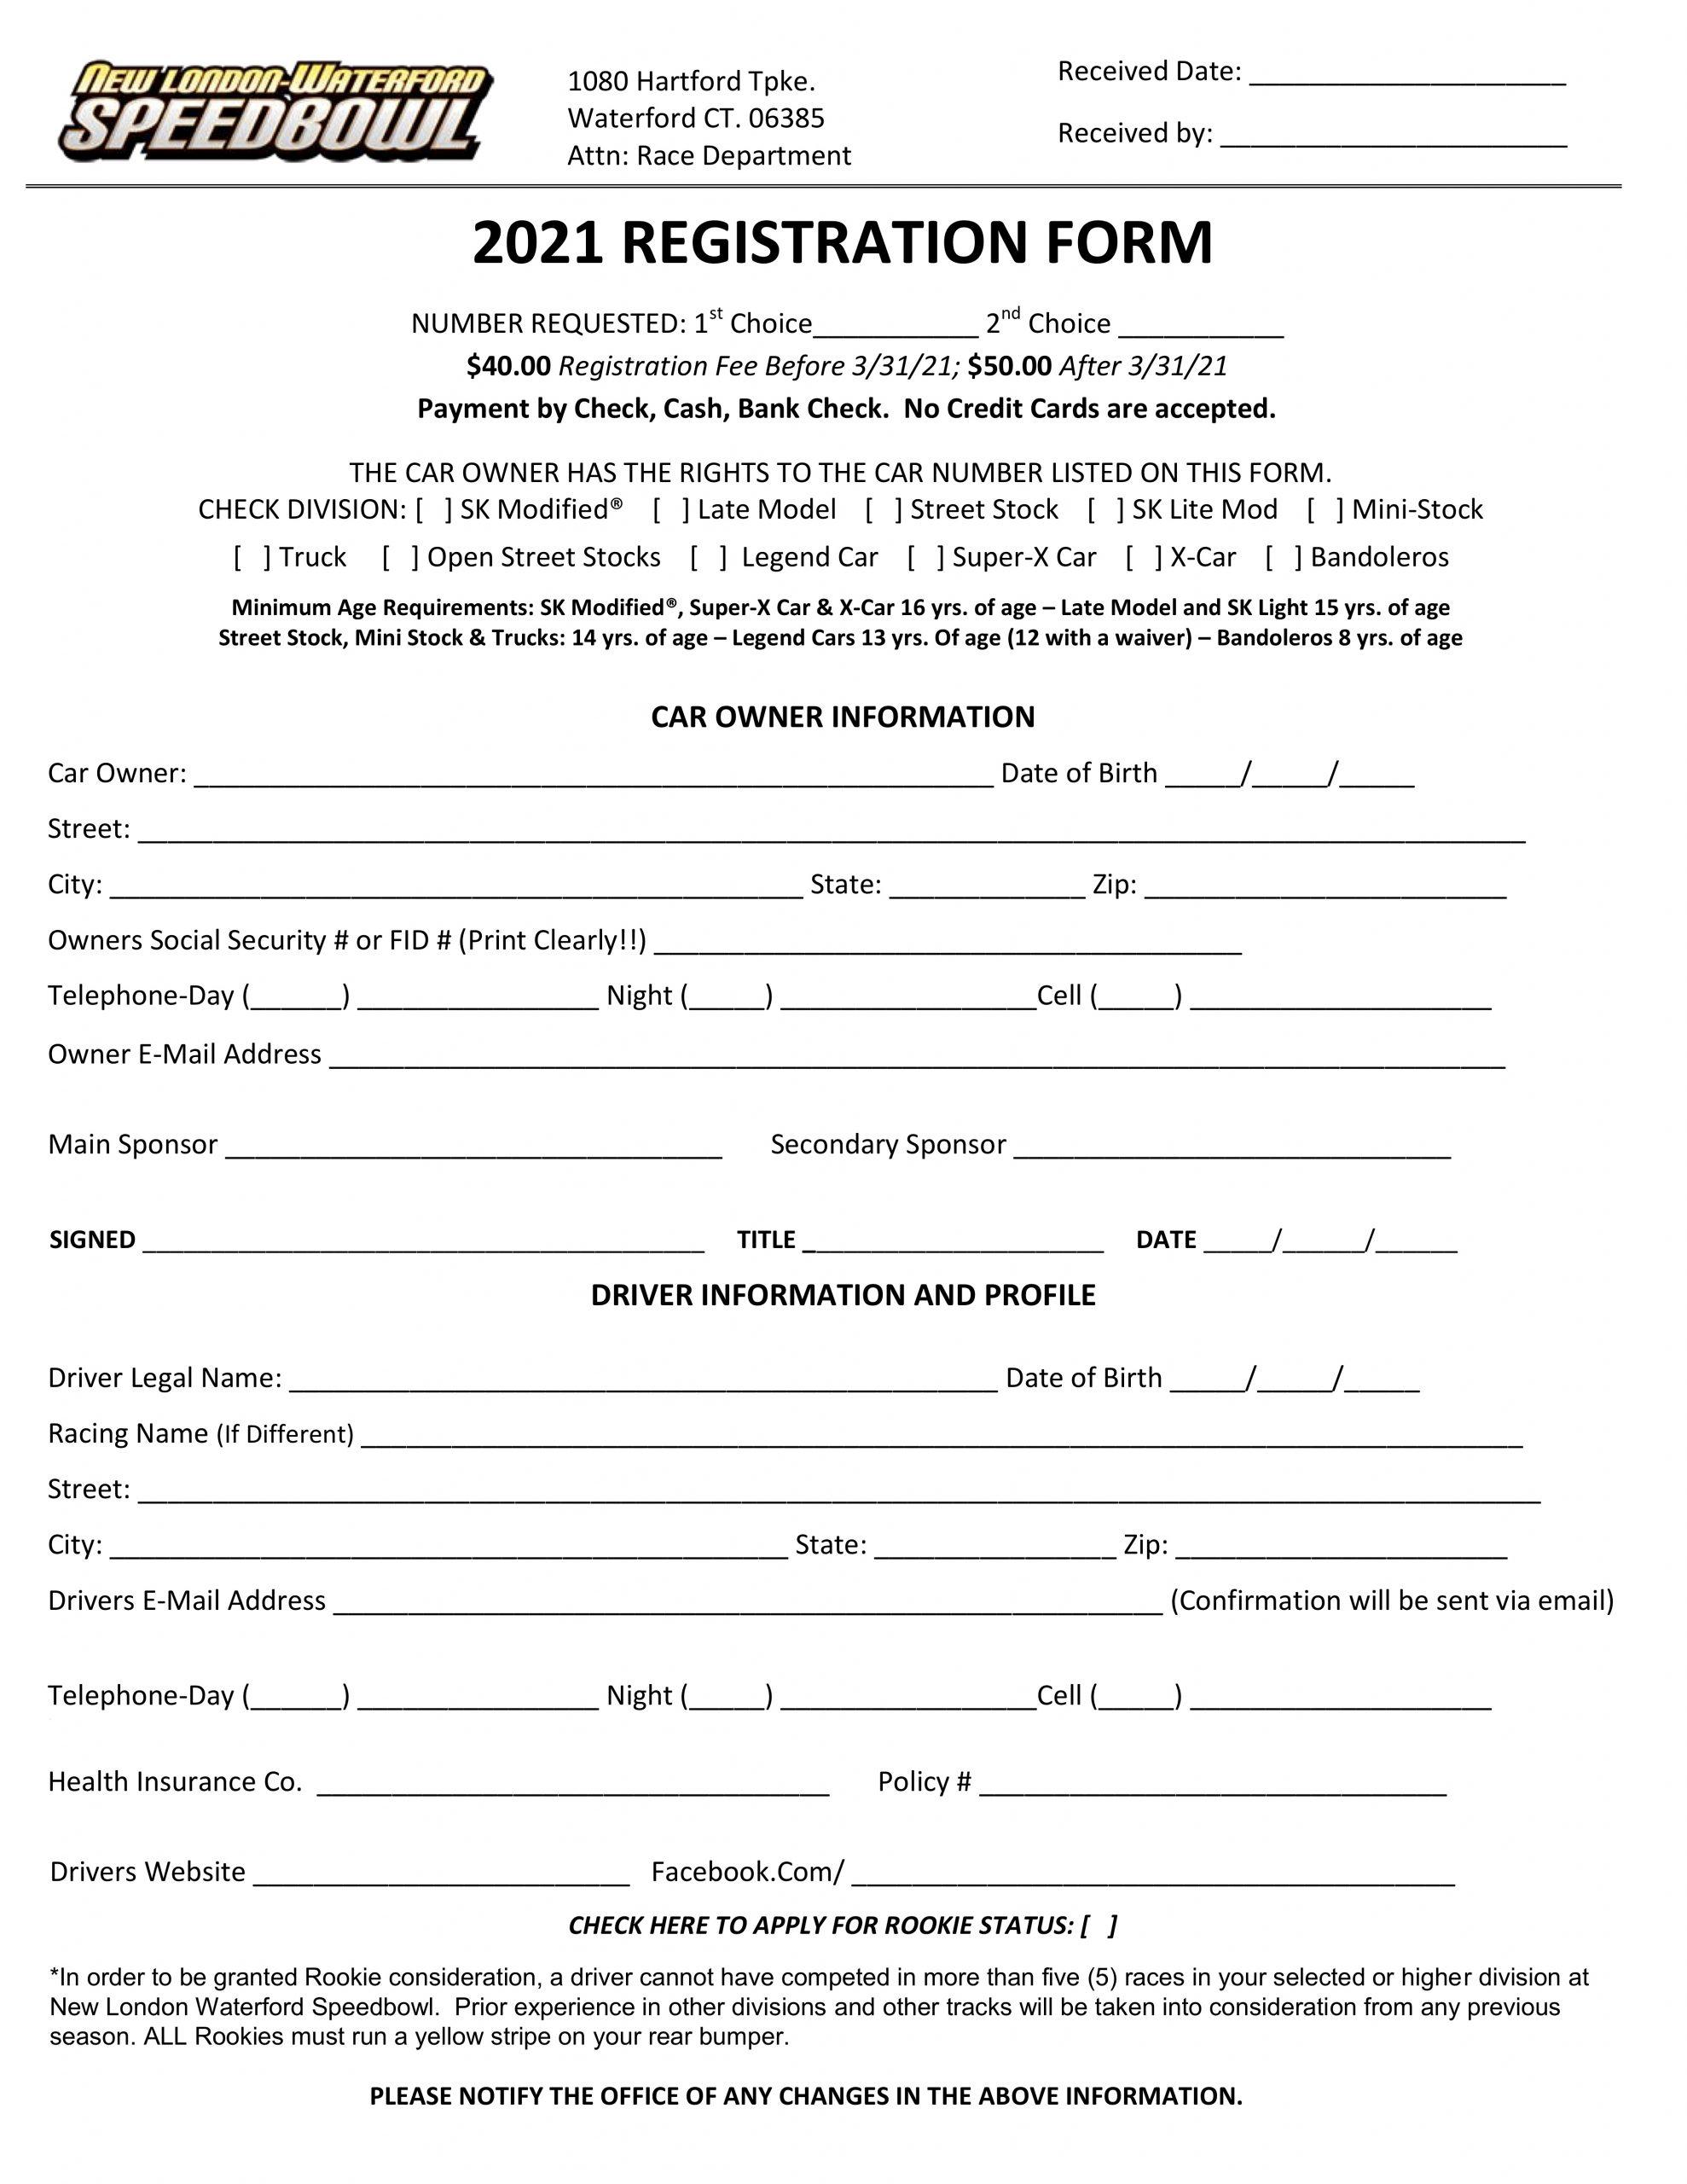 2021-Registration Form-NLWS